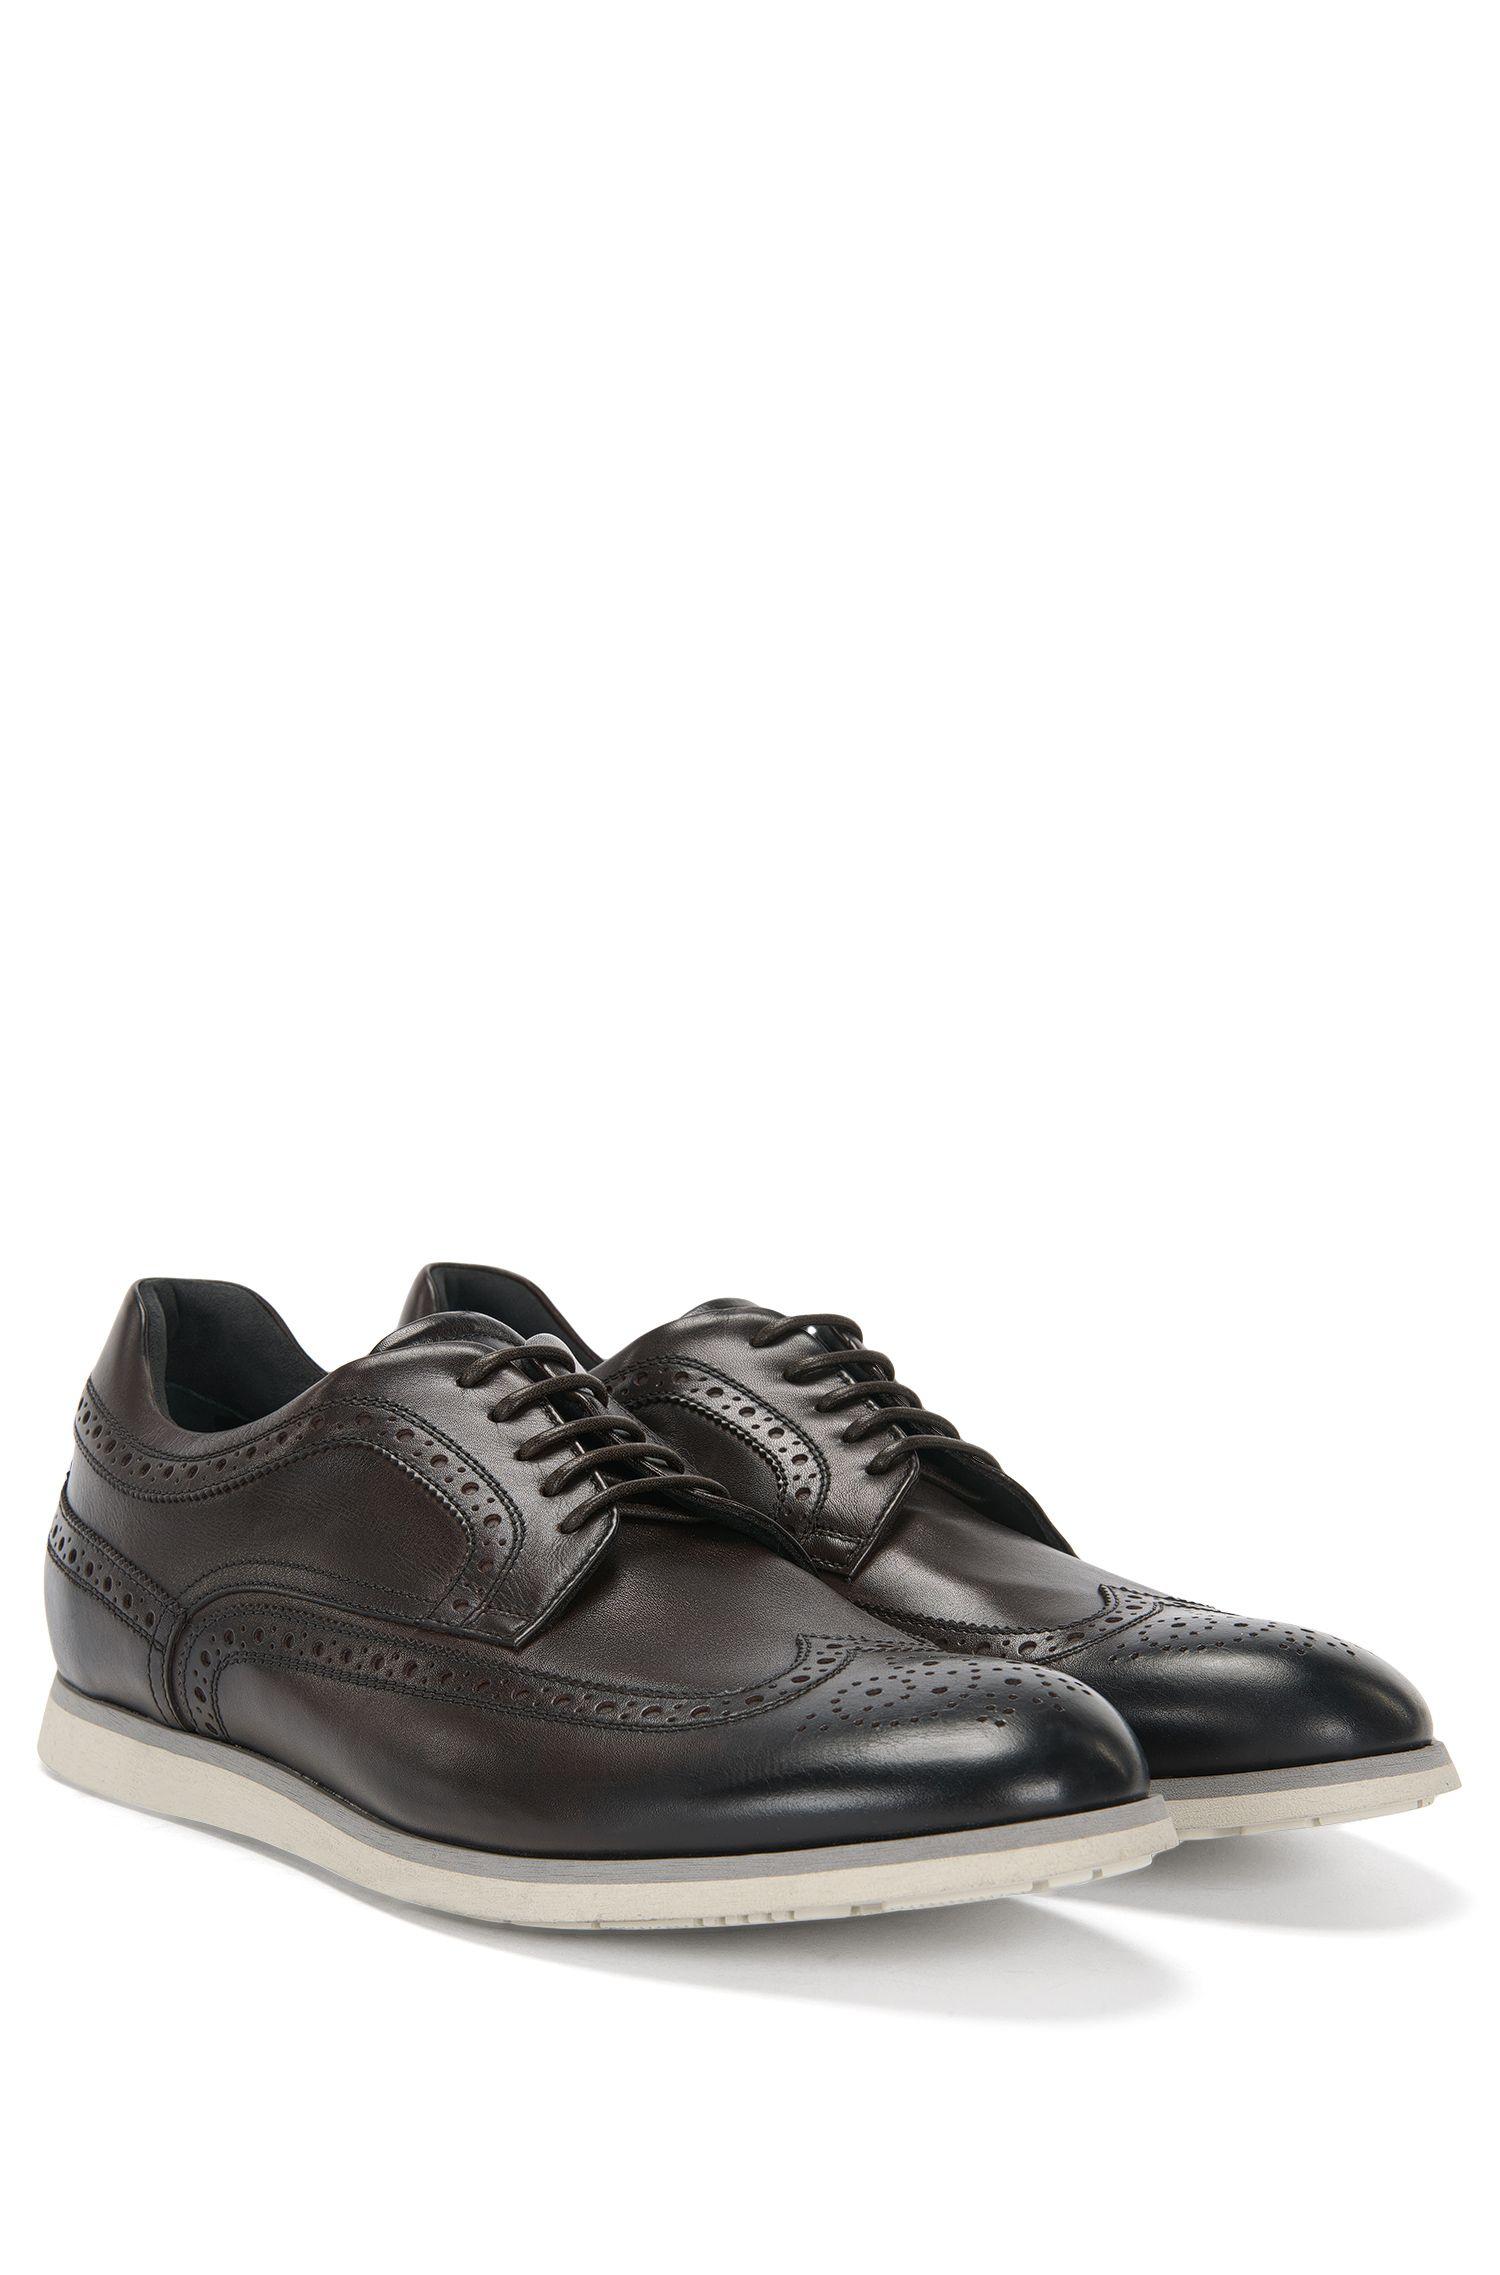 'Pegaso Derb Itwtb'   Italian Calfskin Brogue Derby Shoes